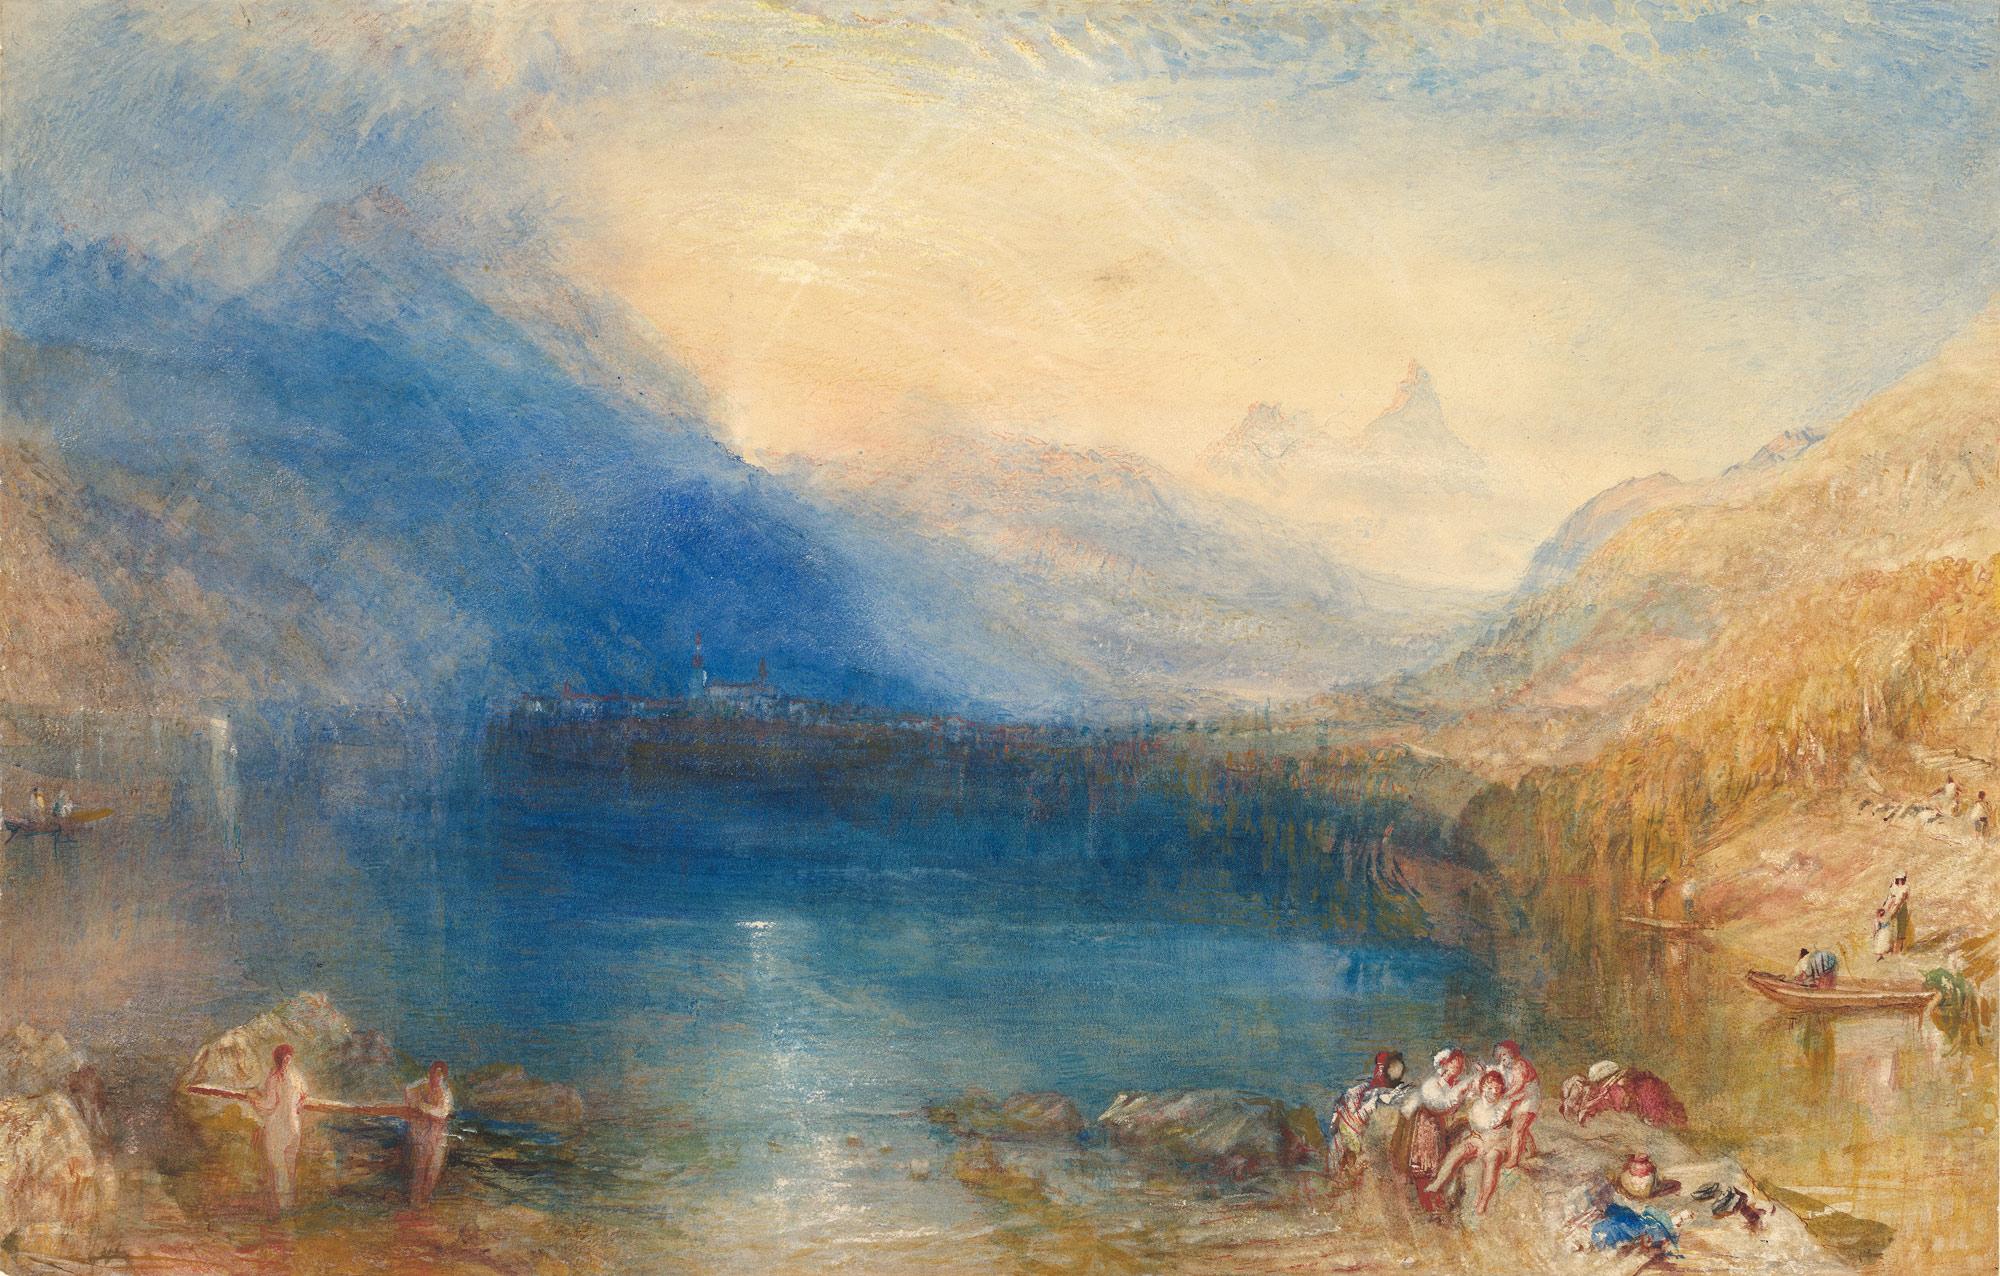 Watercolor art history - The Lake Of Zug